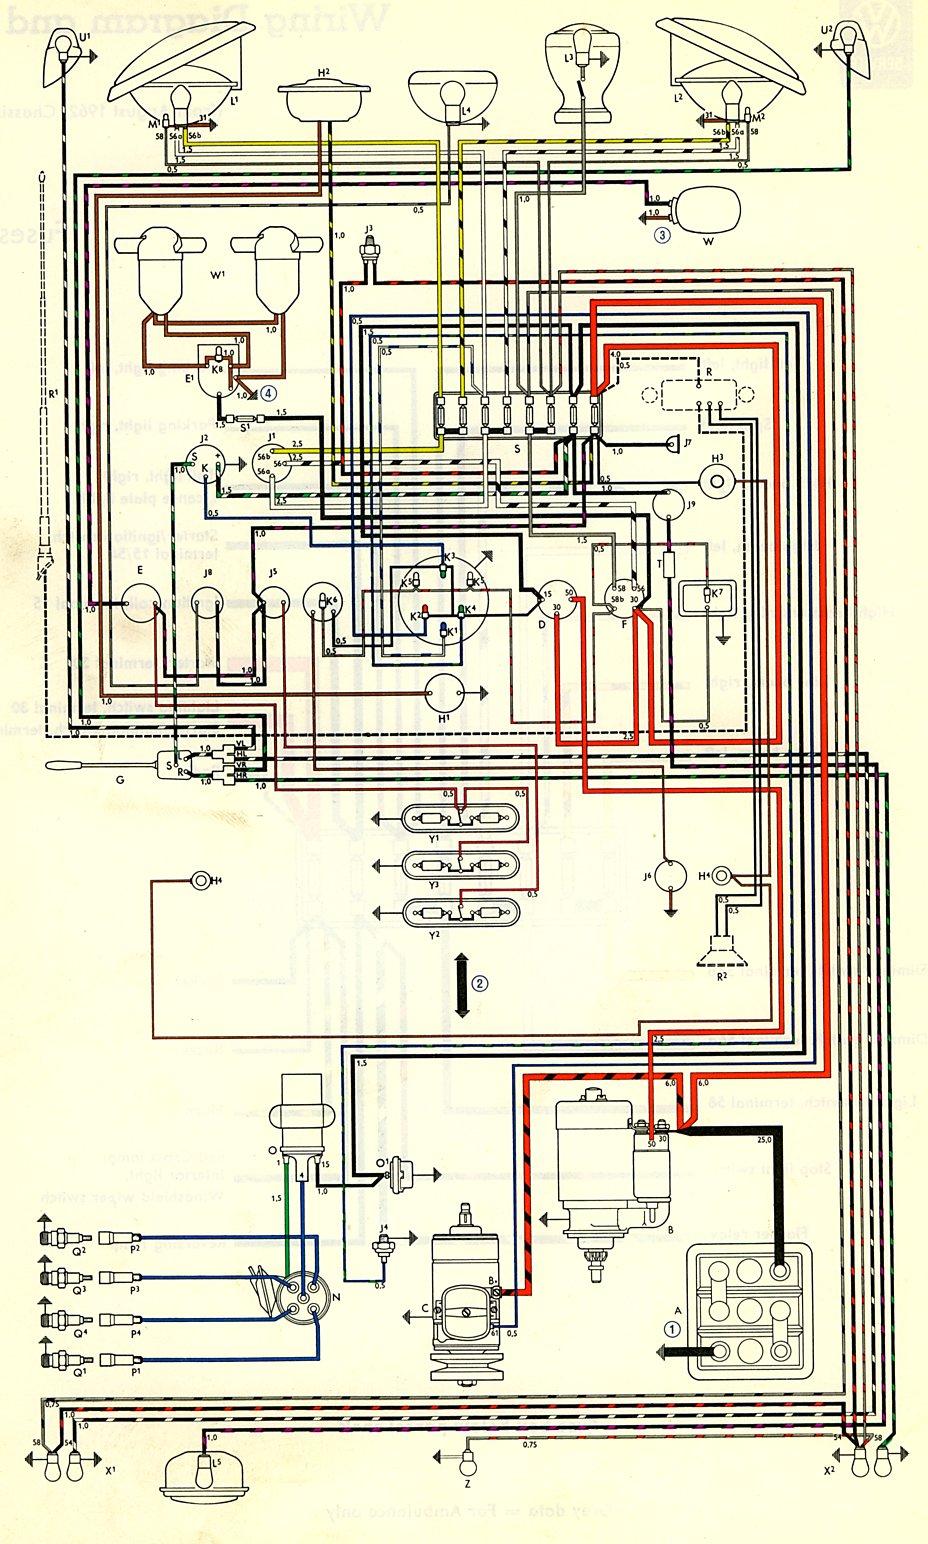 Thomas Bus Wiring Diagrams Explained 2003 Schematics 1999 Diagram Schematic Hdx School